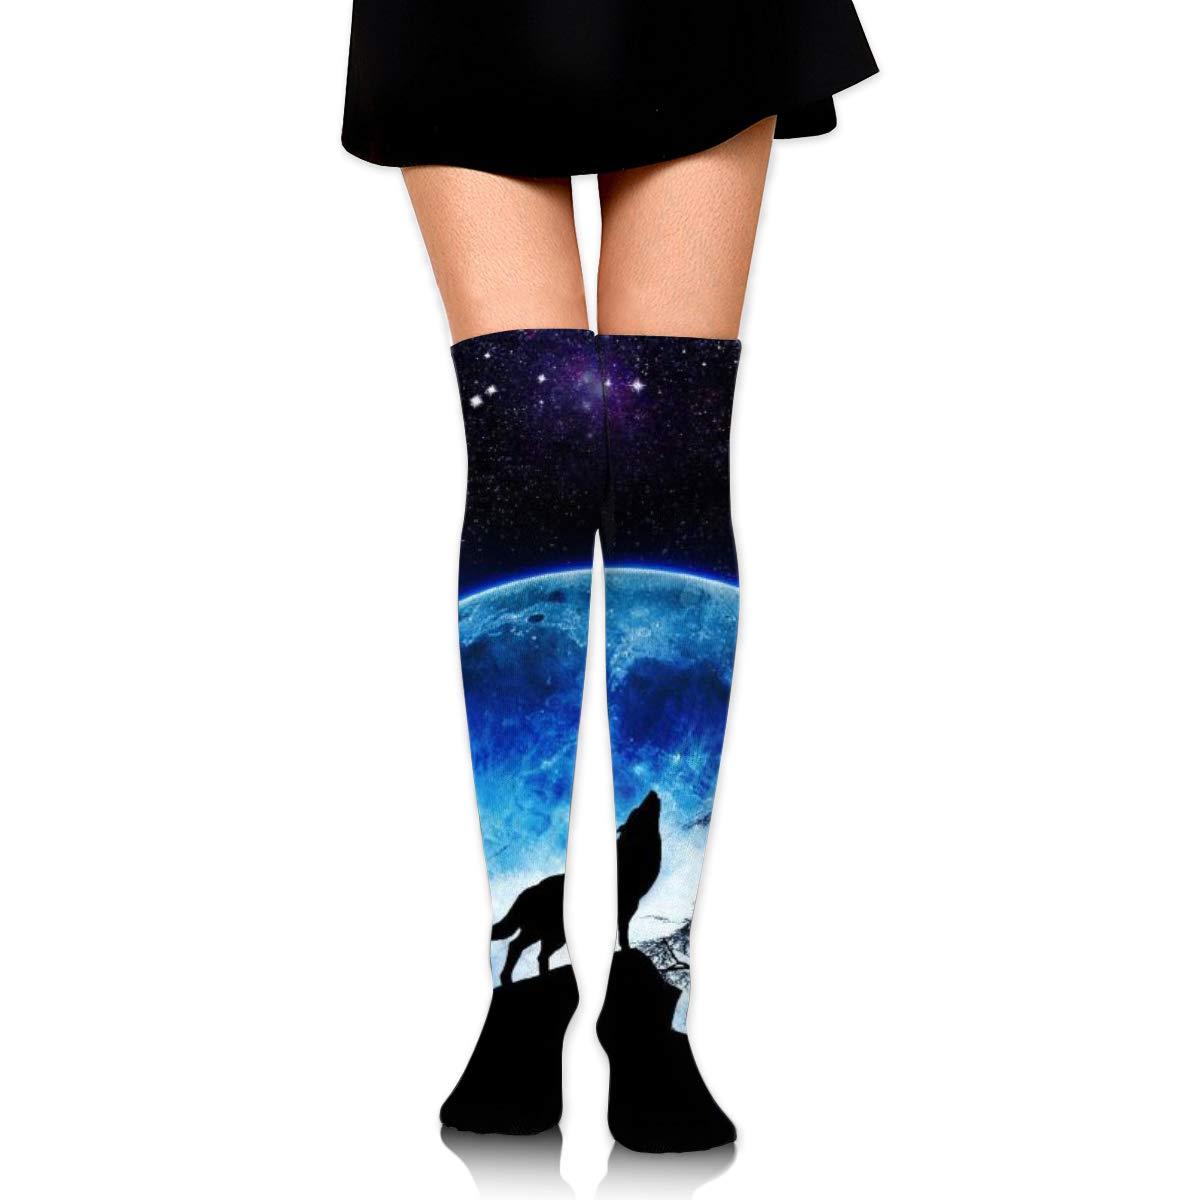 Women Crew Socks Thigh High Knee Wolf Moonlight Long Tube Dress Legging Sport Compression Stocking